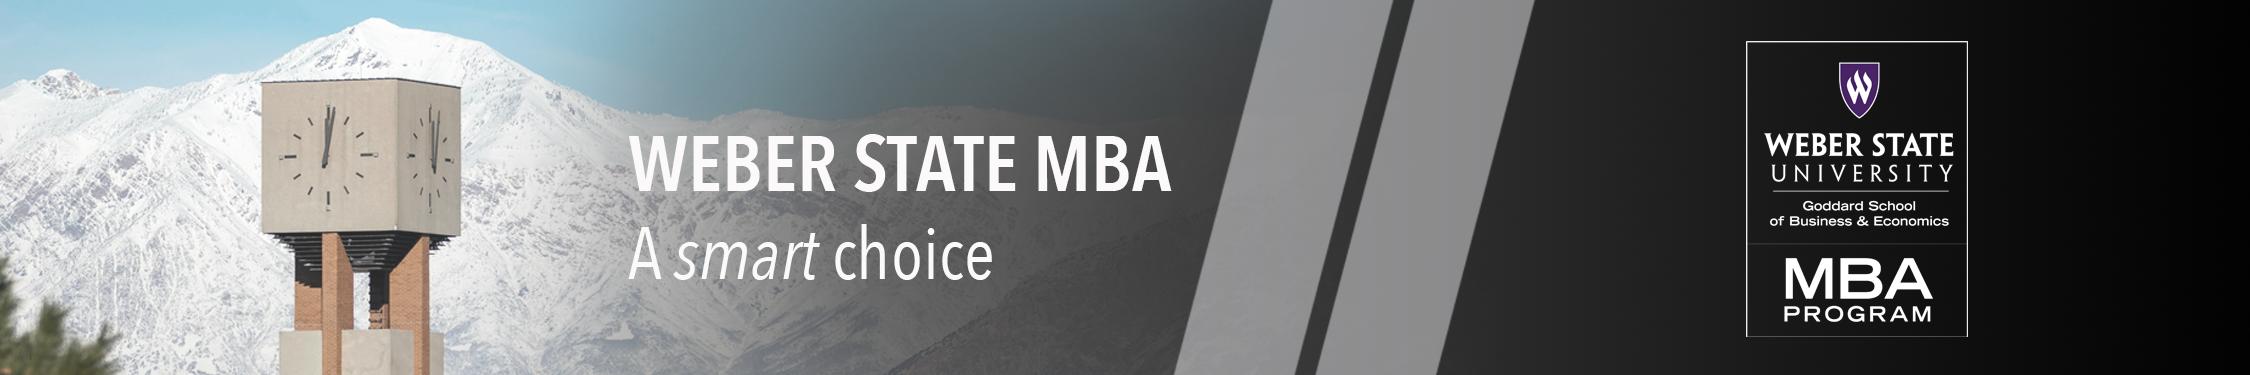 Weber State MBA, a smart choice!